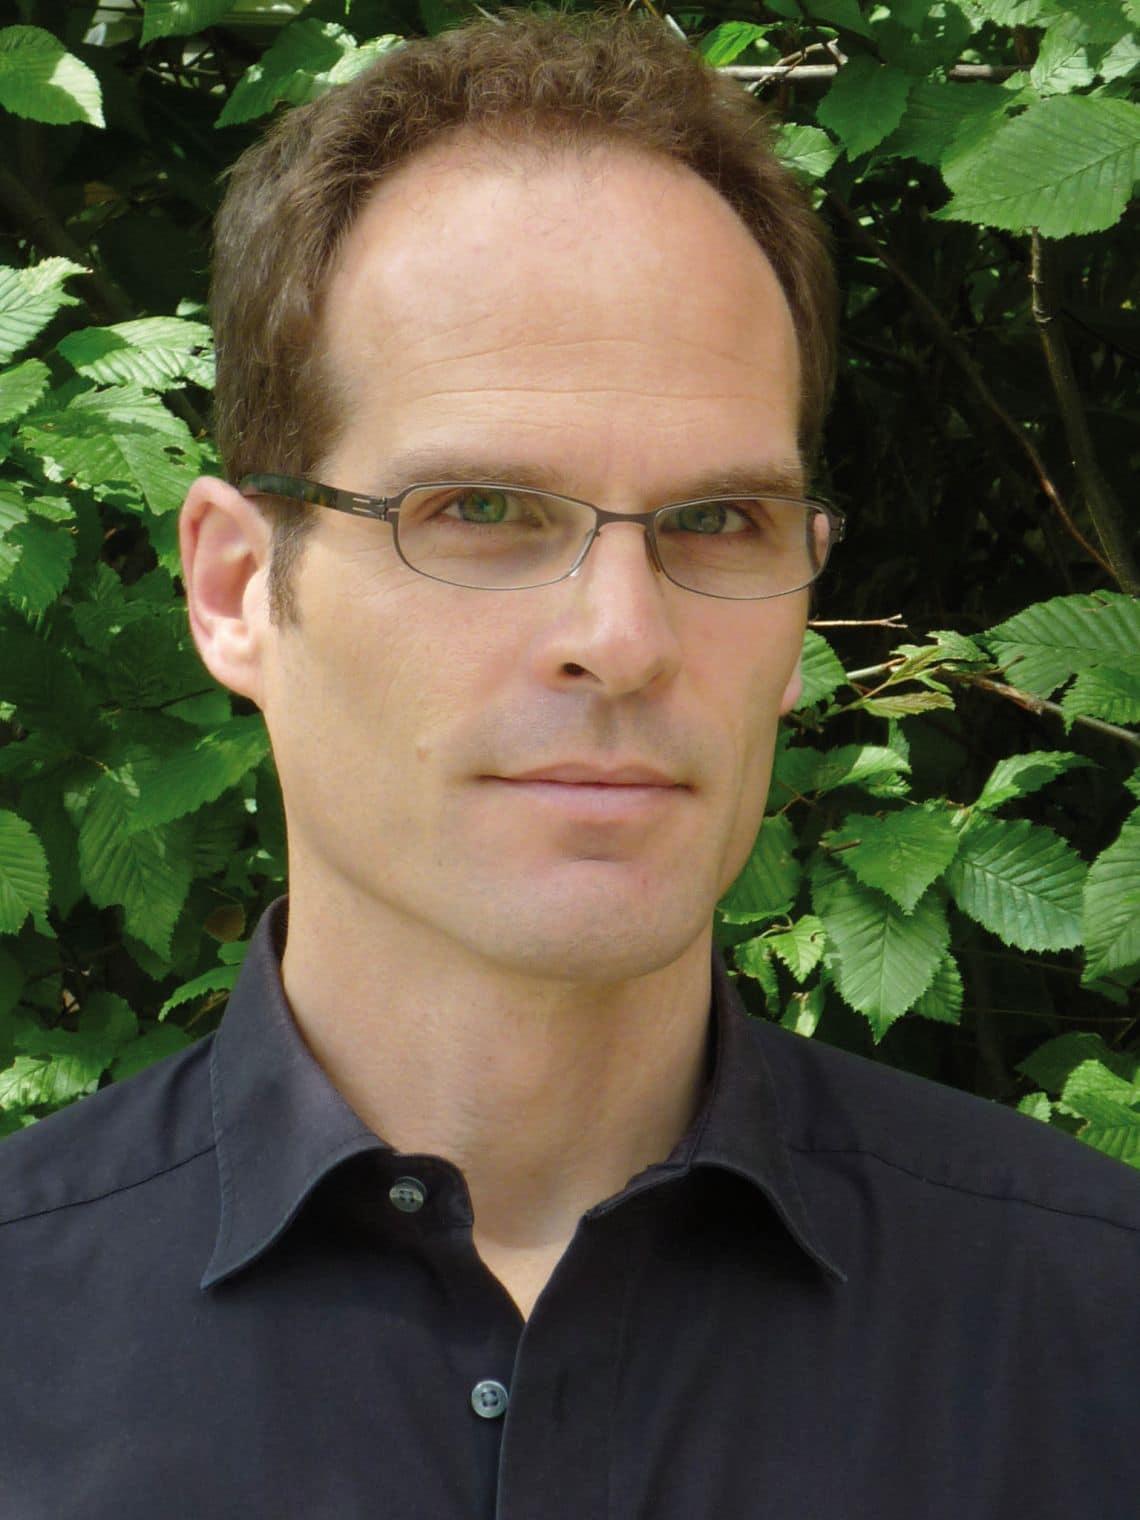 Christian Hillermann (c) Kim Howard